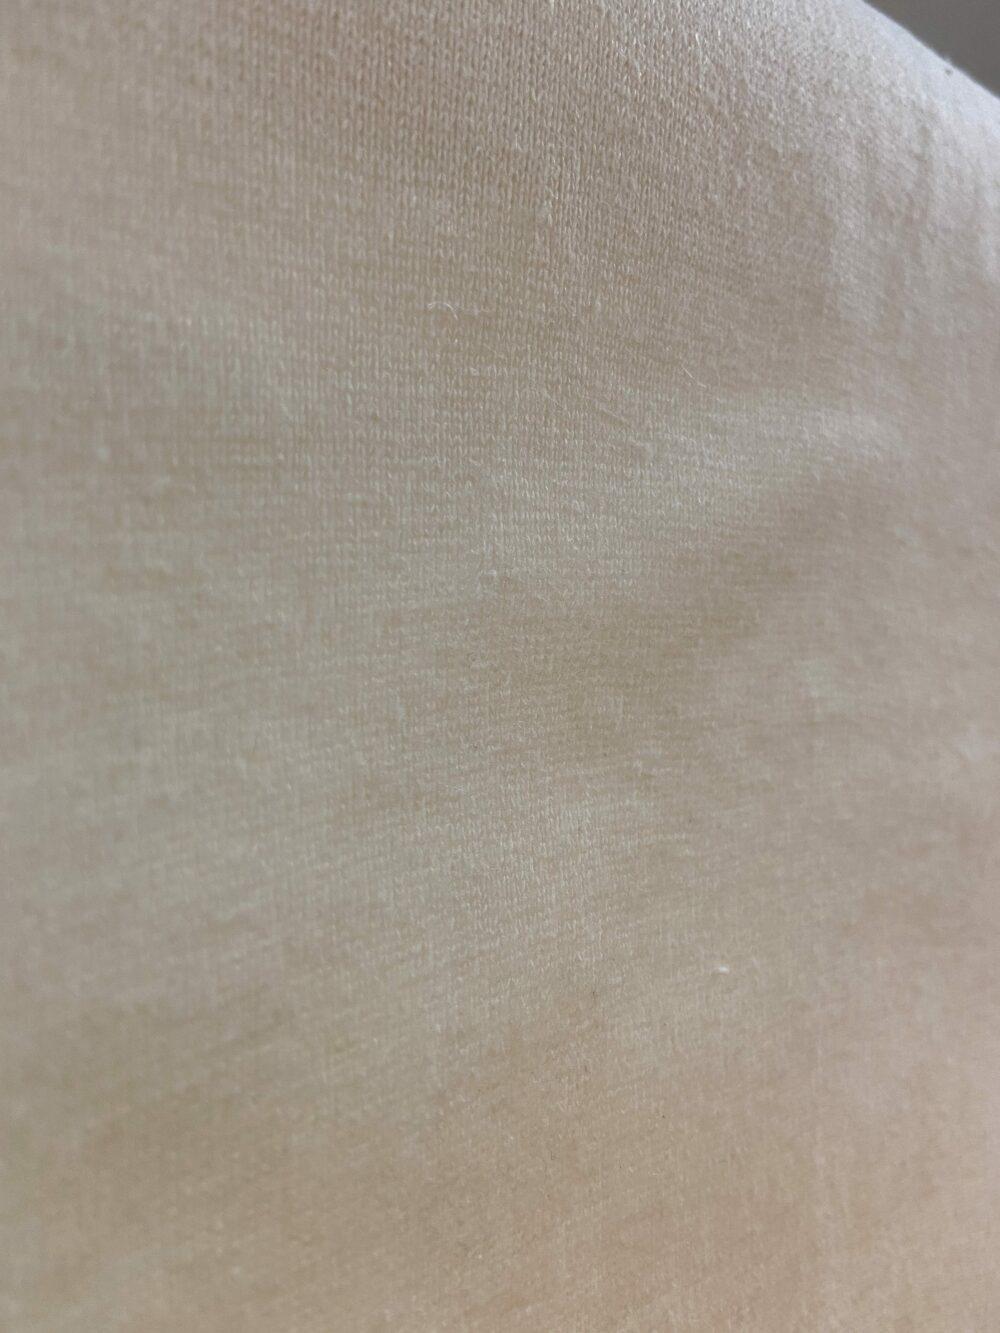 Raw Jersey Knit Hemp Fabric